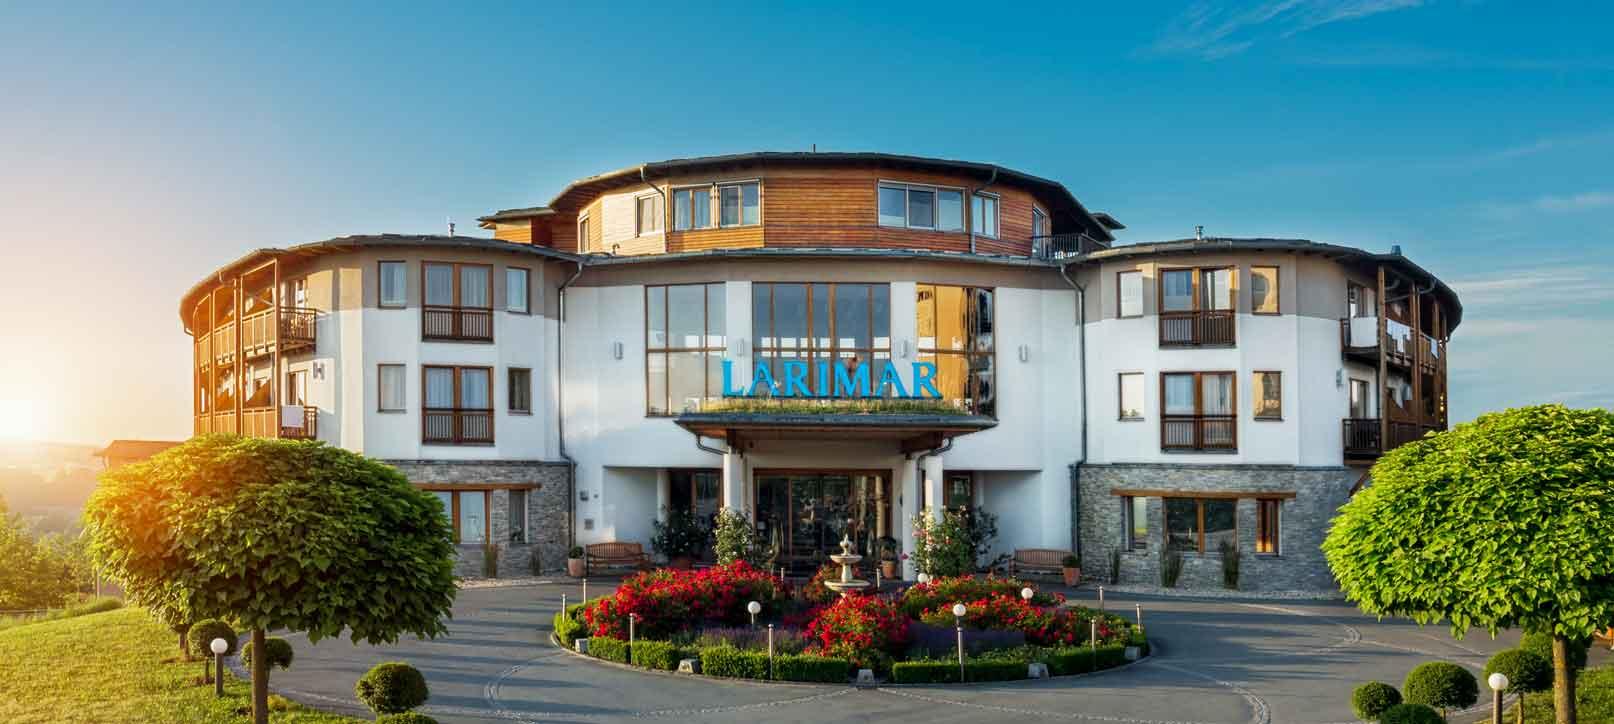 Hotel Larimar in Stegersbach